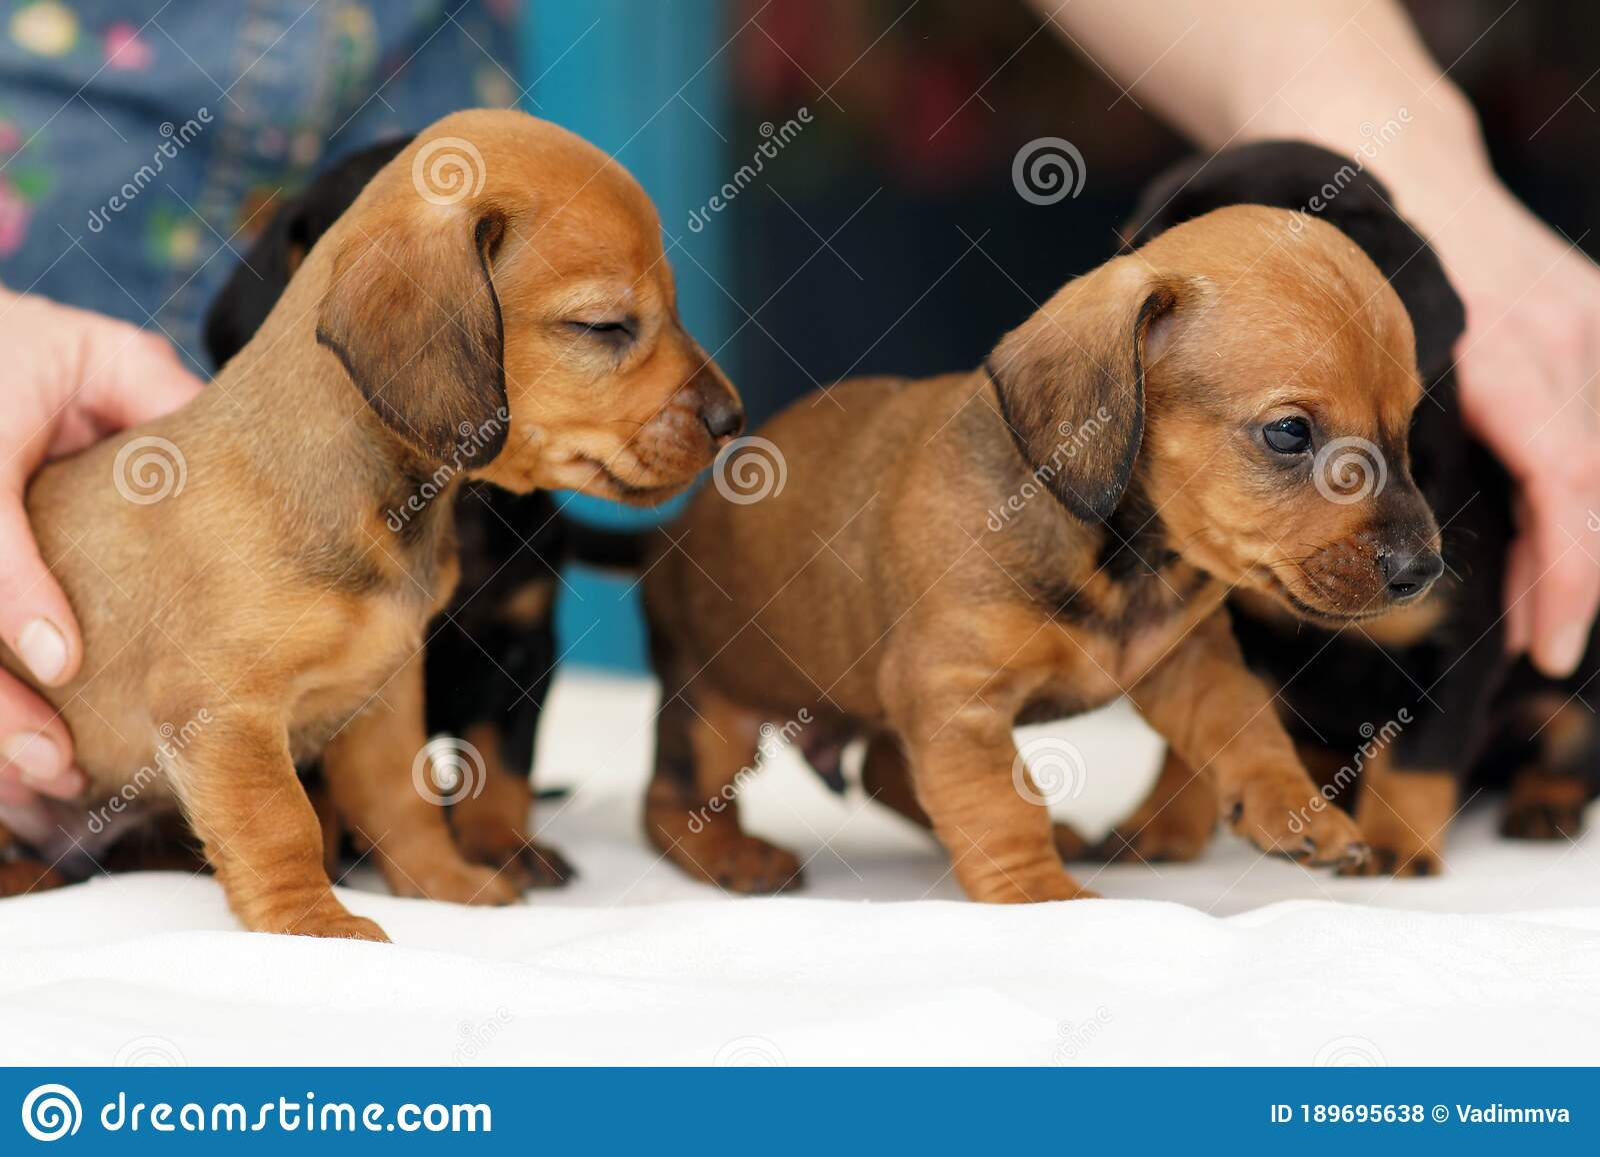 Cute Dachshund Puppies Stock Photo Image Of Dachshund 189695638